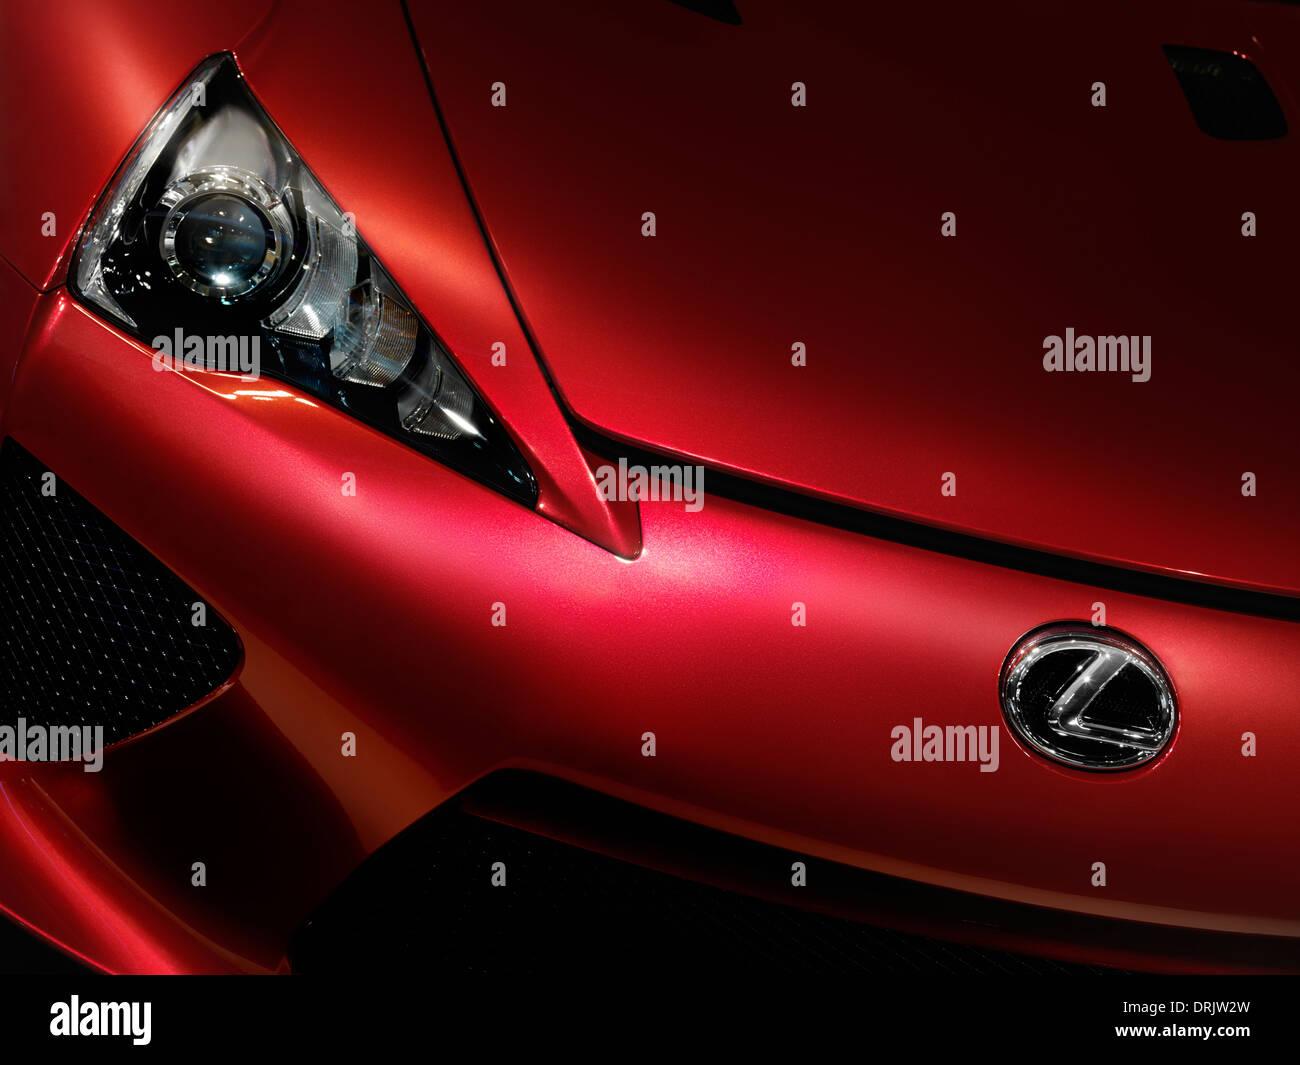 Closeup of red 2012 Lexus LFA supercar detail - Stock Image